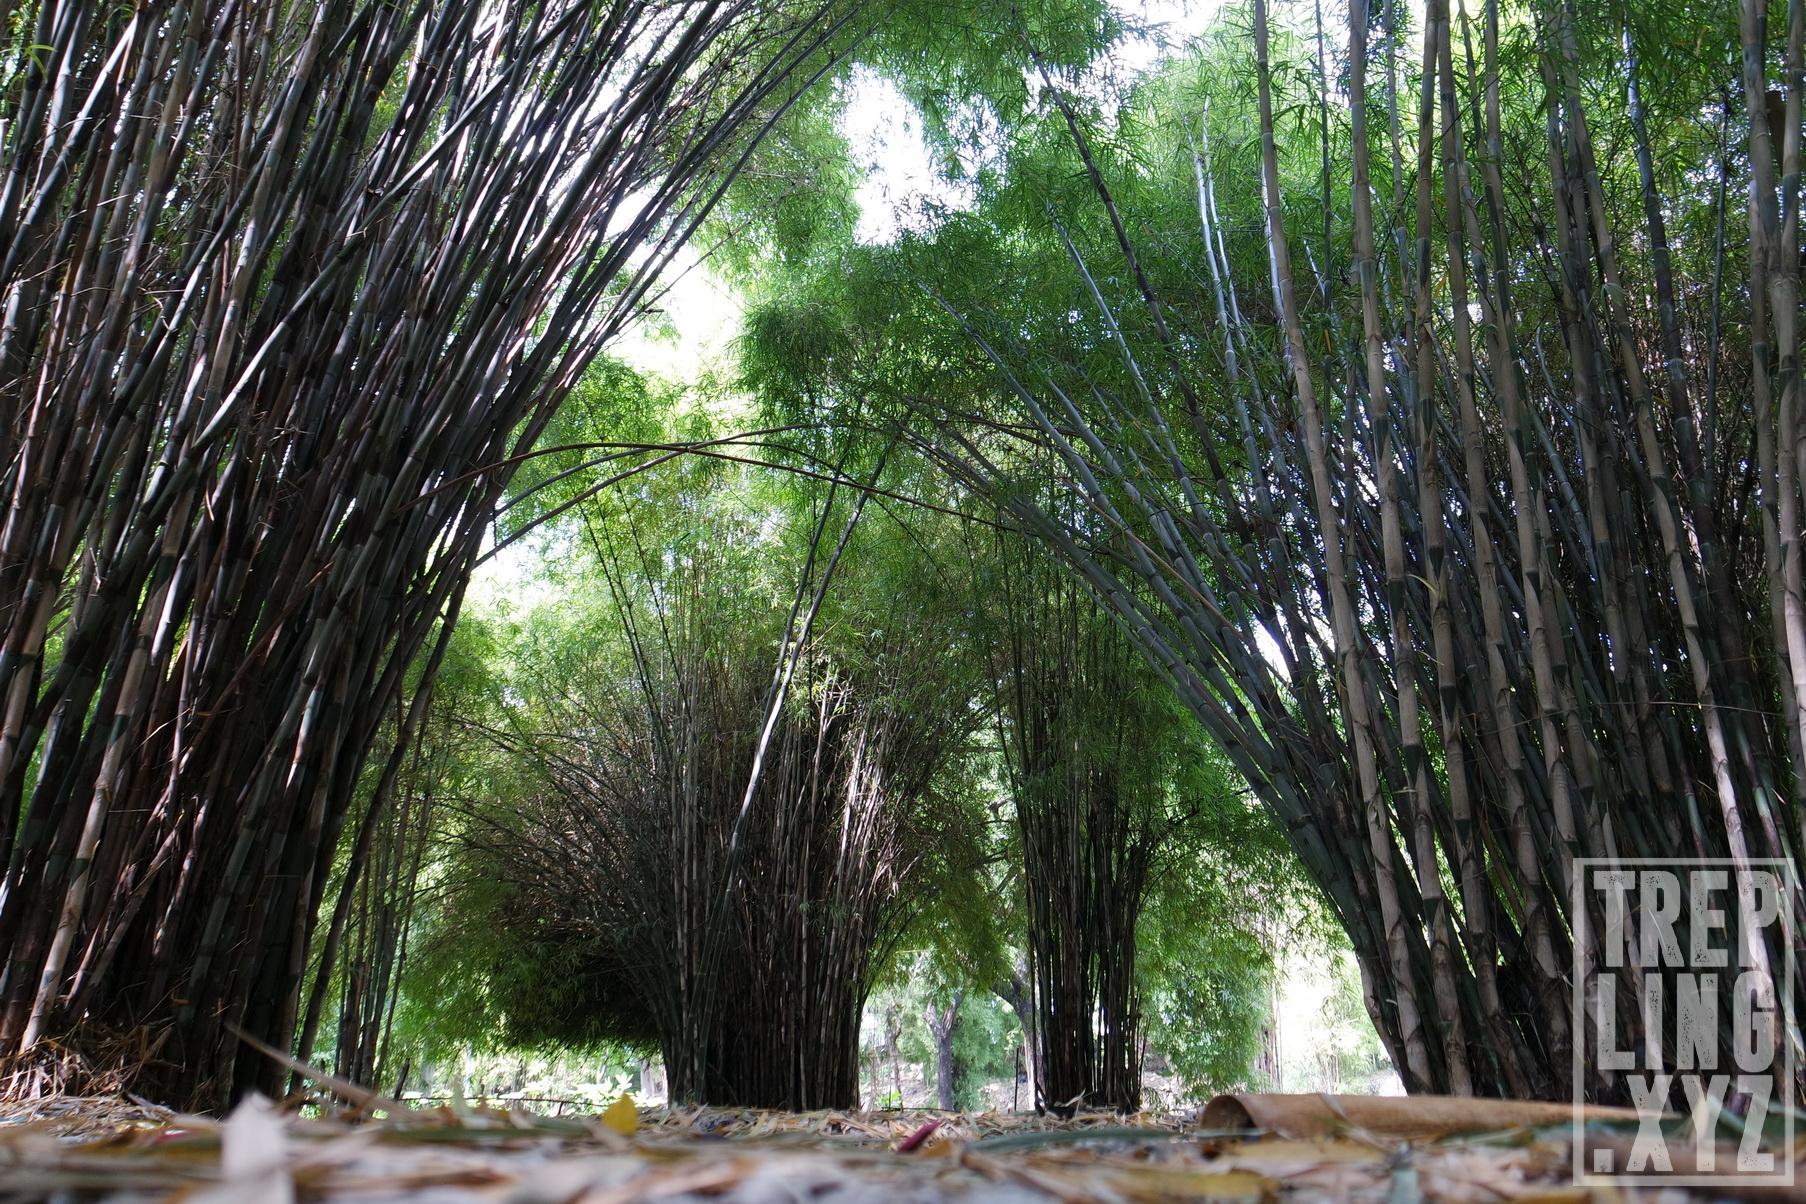 Wisata Alam Hutan Bambu Taman Sakura Keputih Surabaya Penampakan Kota